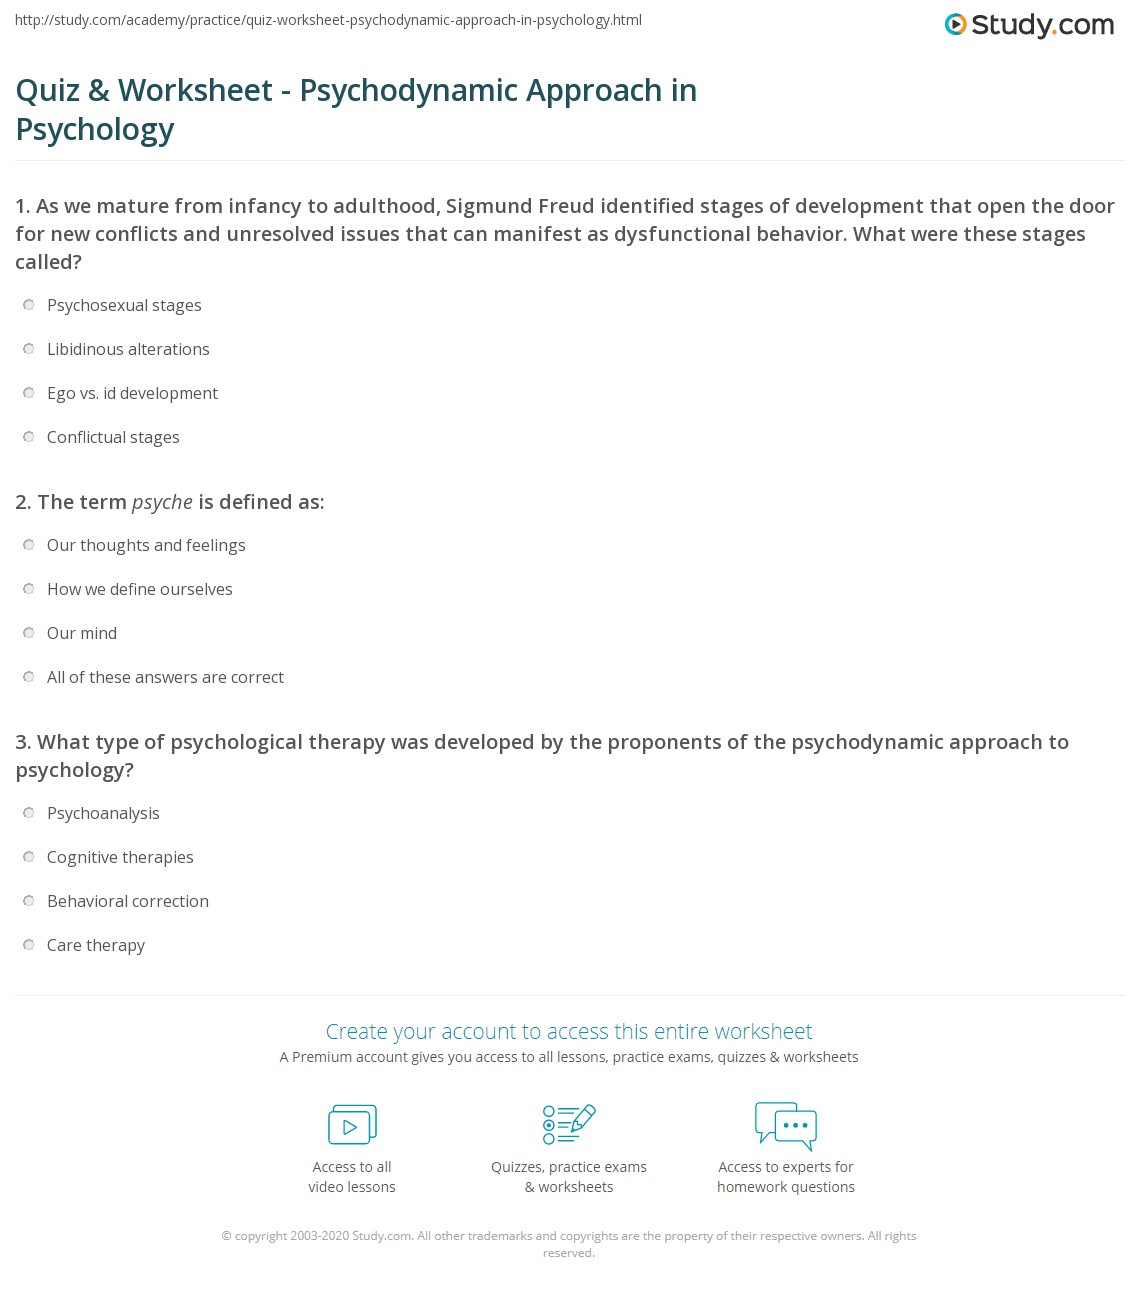 history of psychodynamic approach